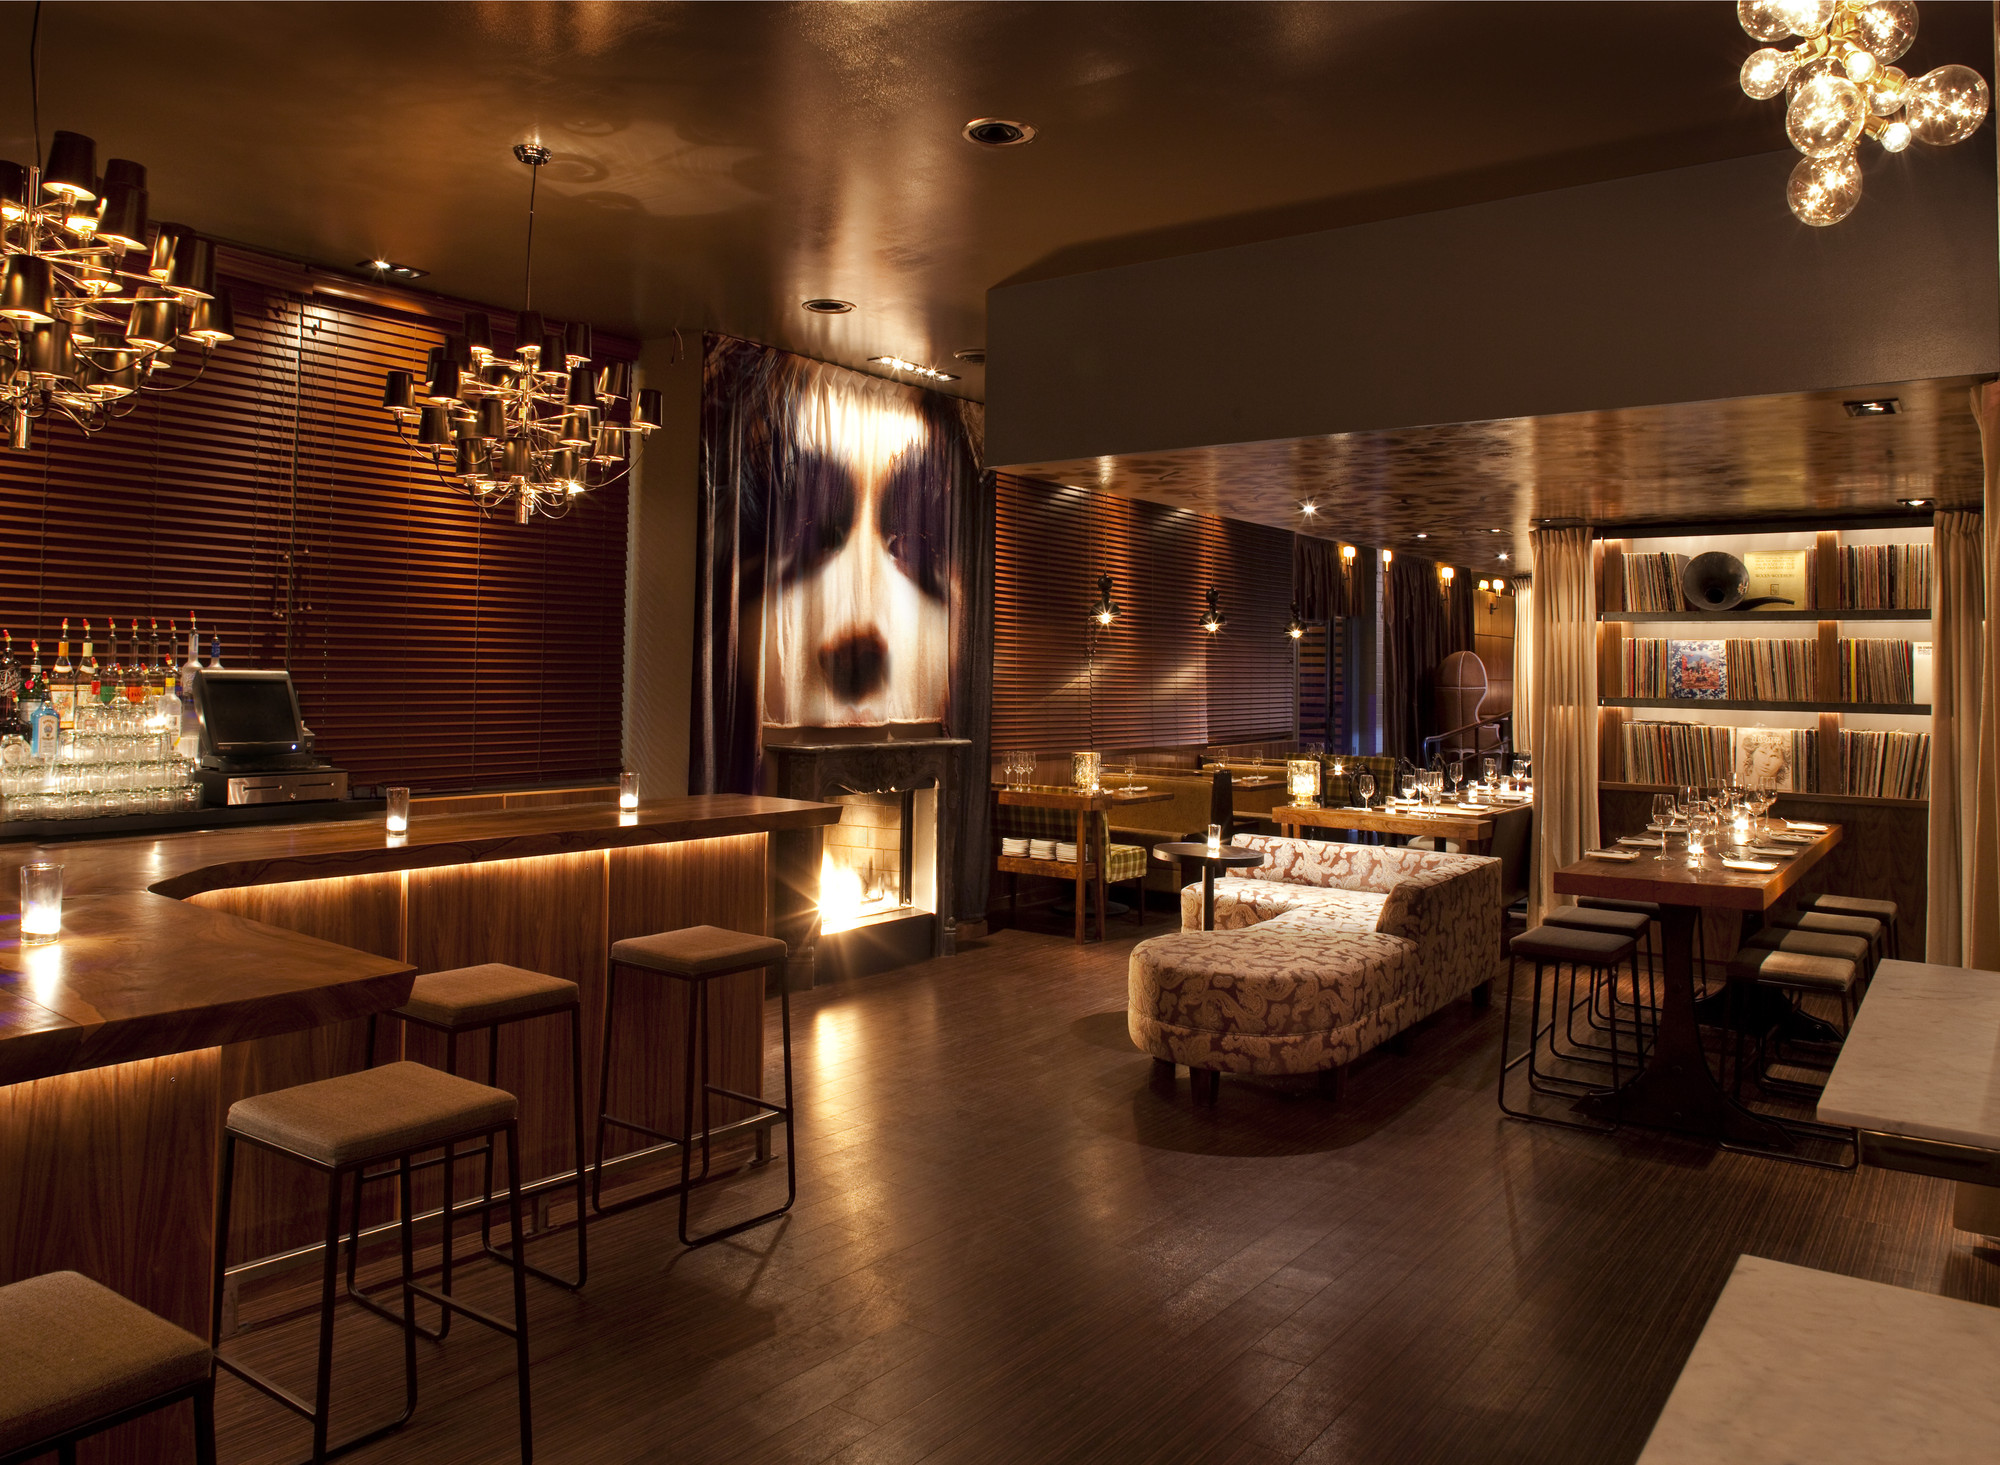 Chambers eat drink mr important design archdaily - Decoration restaurant bar moderne australie ...